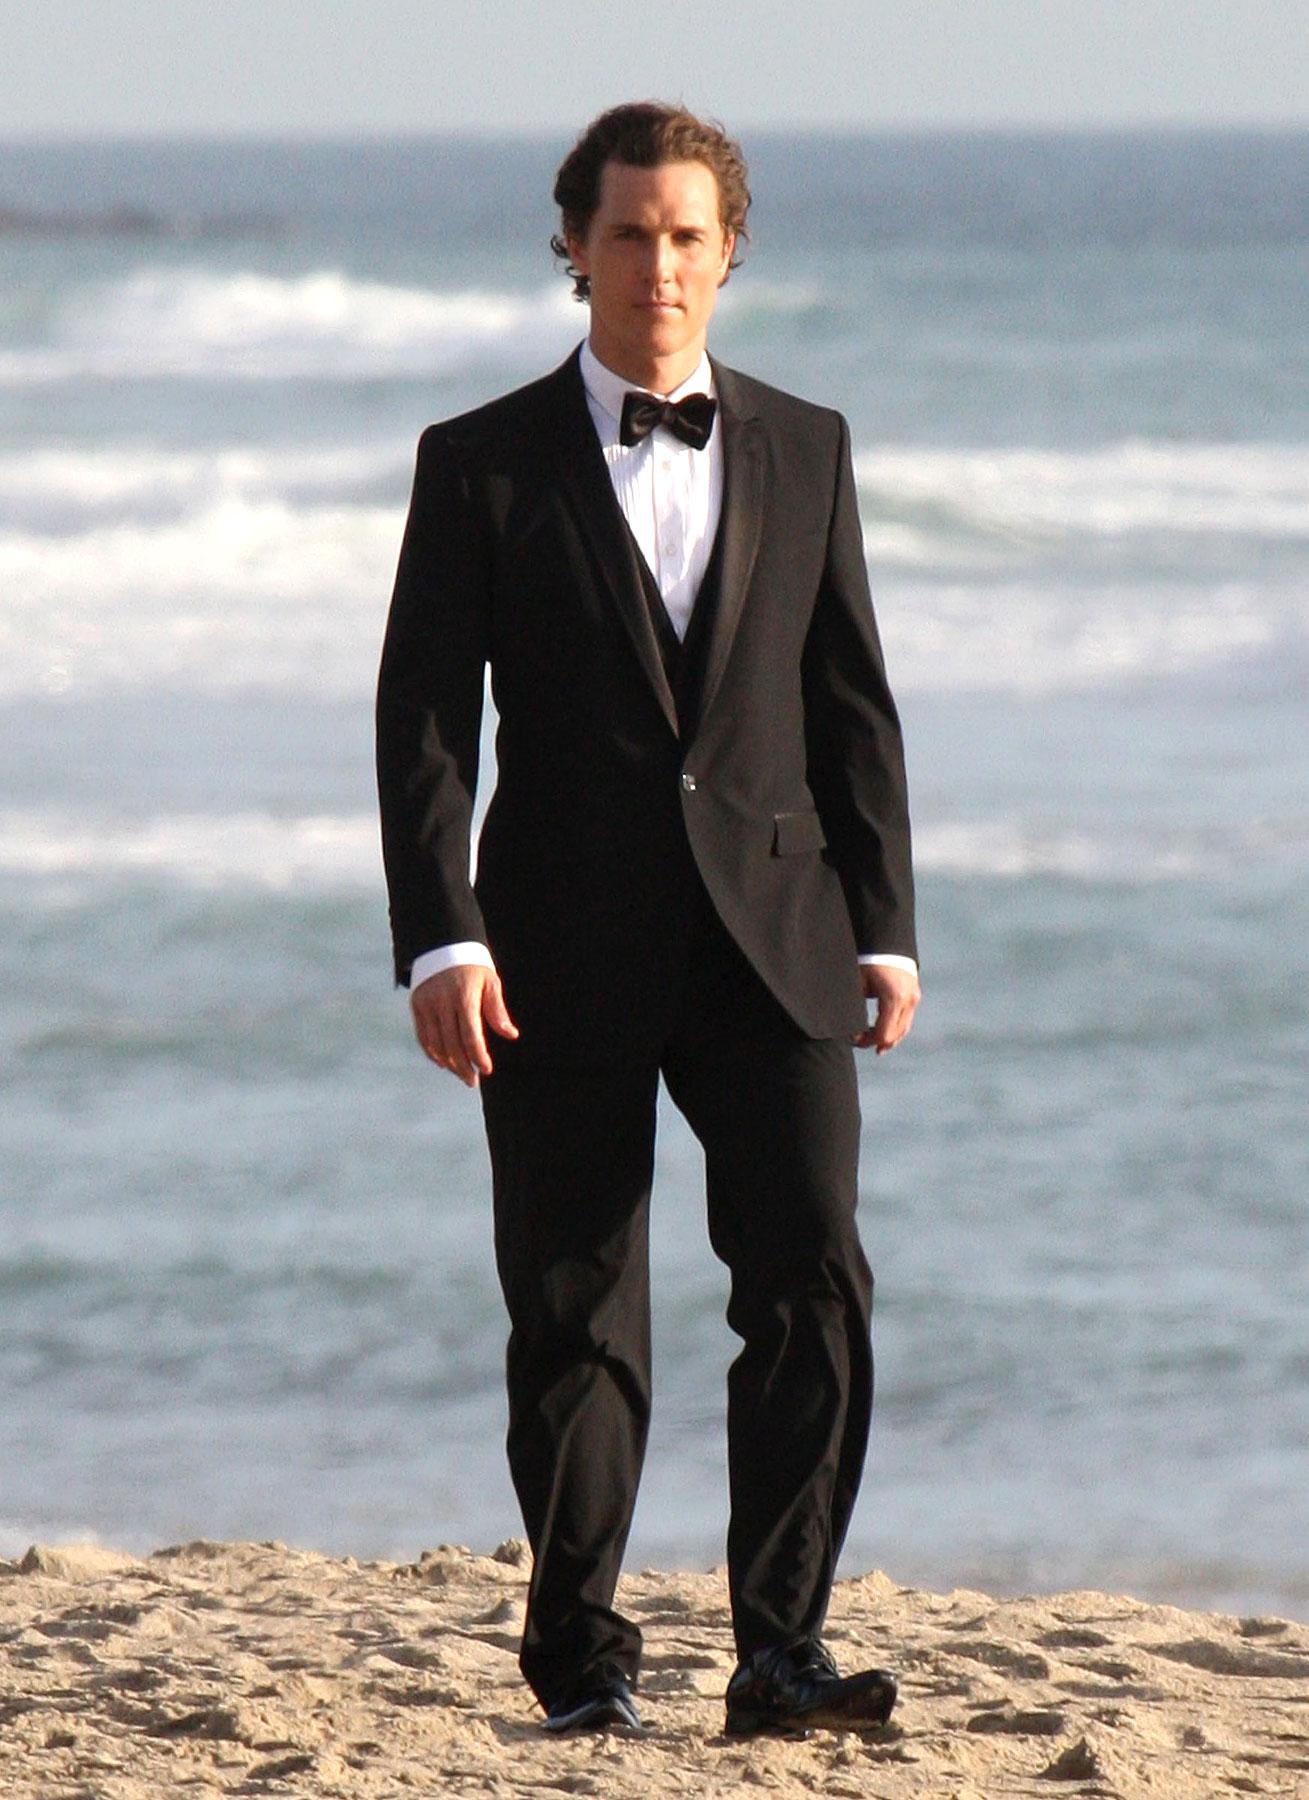 Matthew McConaughey Models the Latest in Beach Formalwear (PHOTOS)